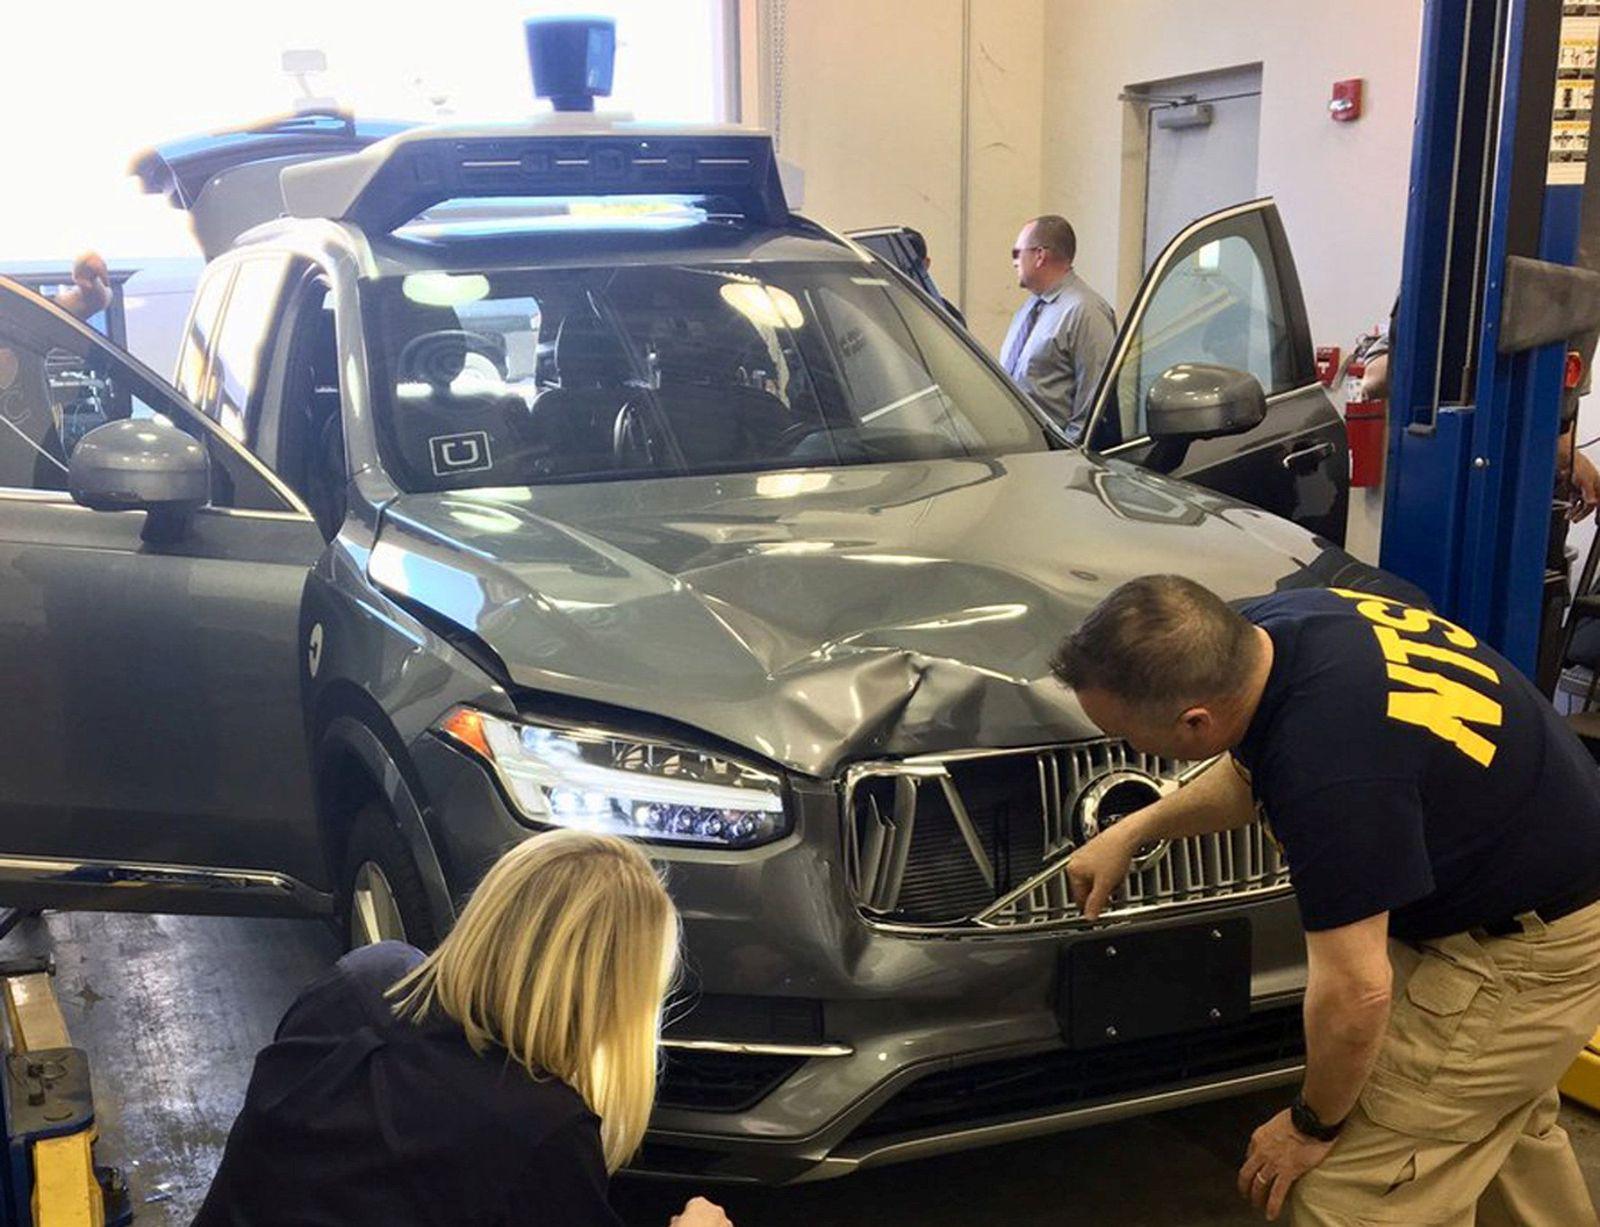 Uber Roboterauto Unfall Inspektion Fahrzeug US-Behörden